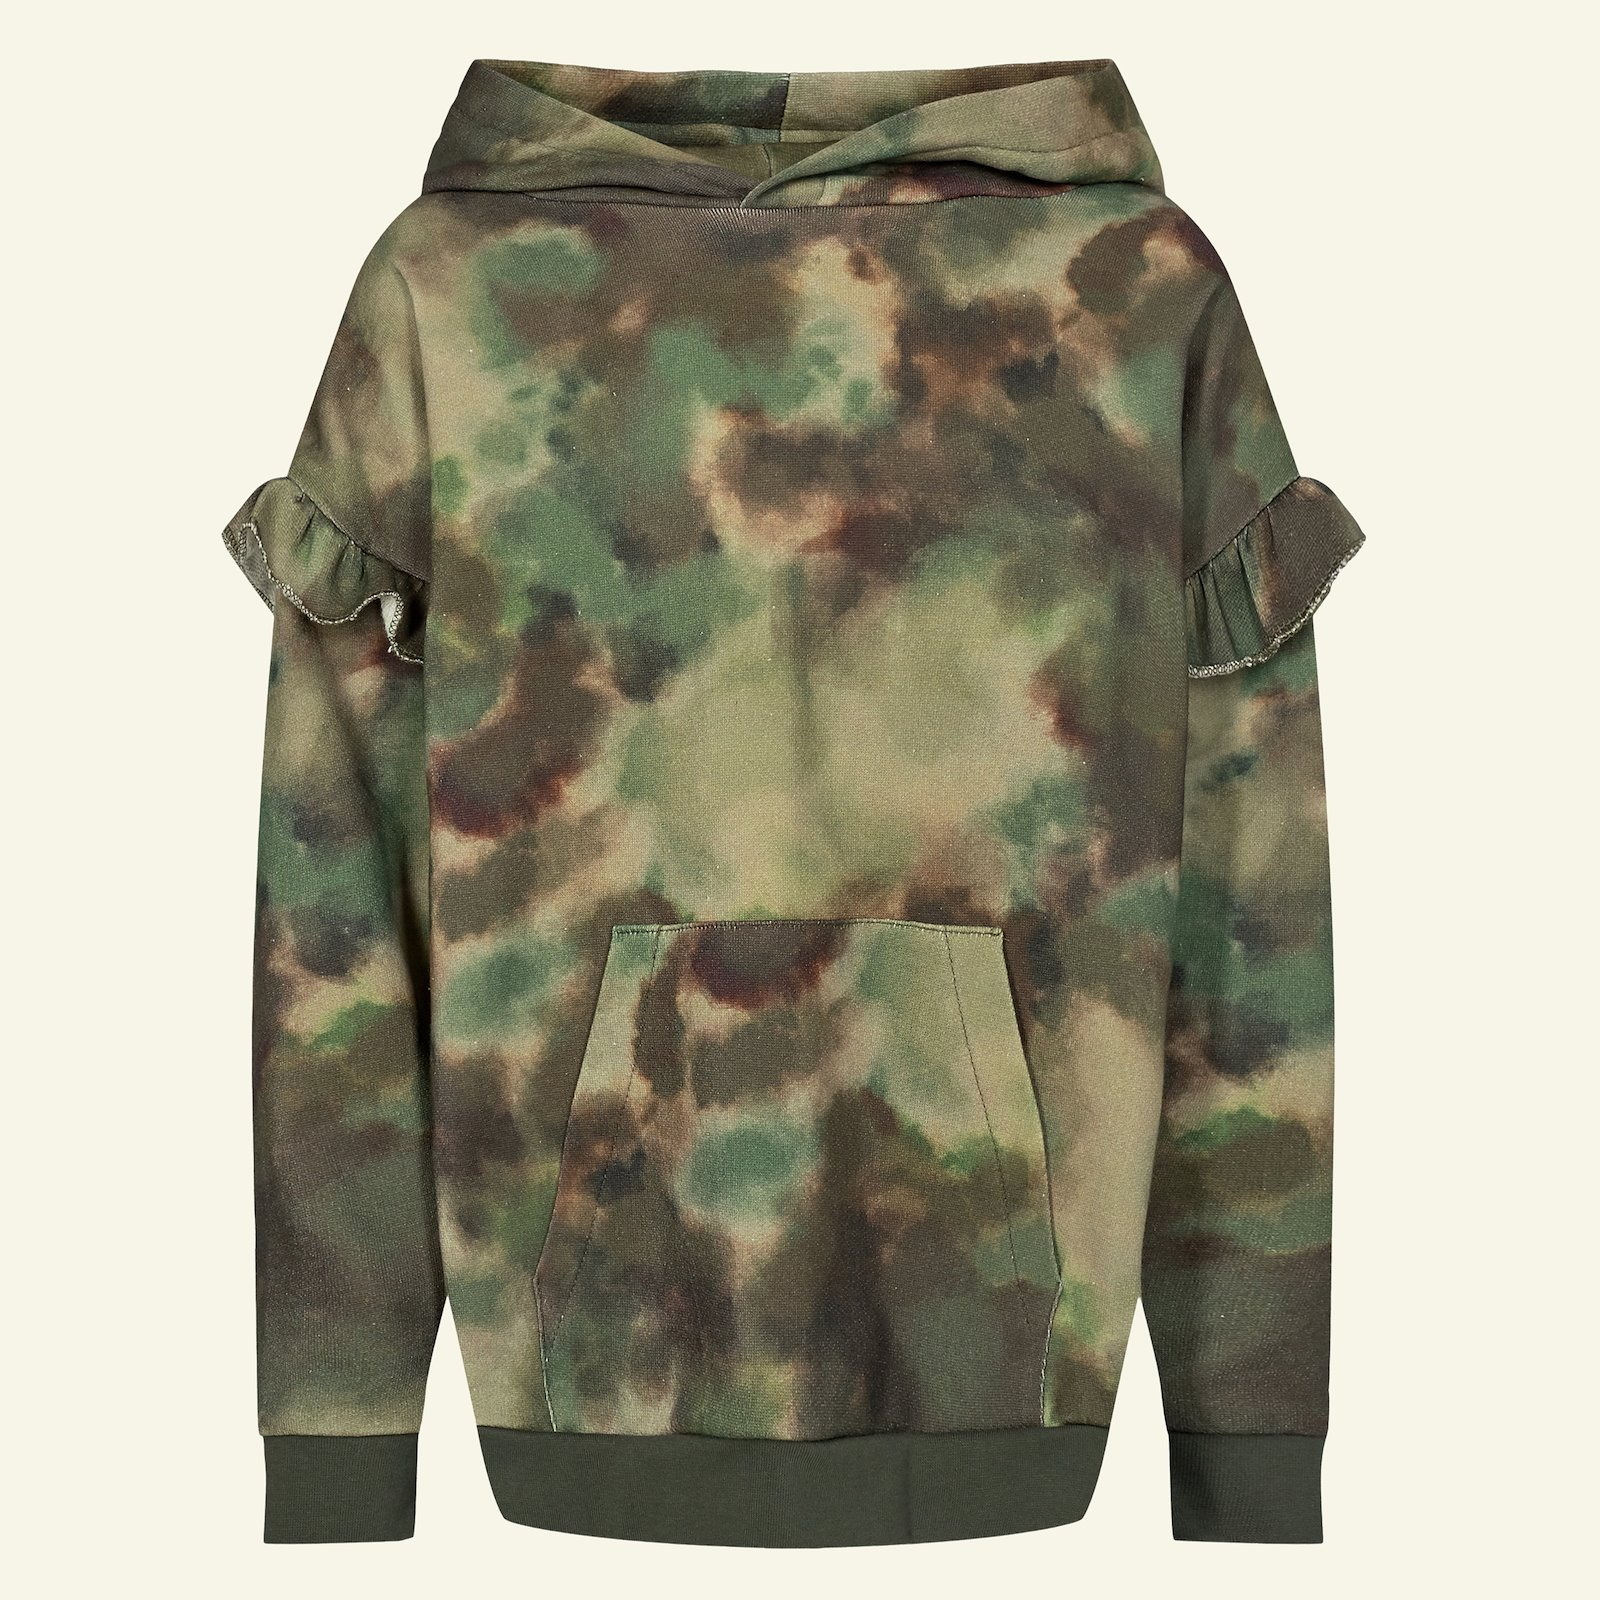 Sweatshirt w. hood + pocket, 134/9y p62020_211774_230057_sskit